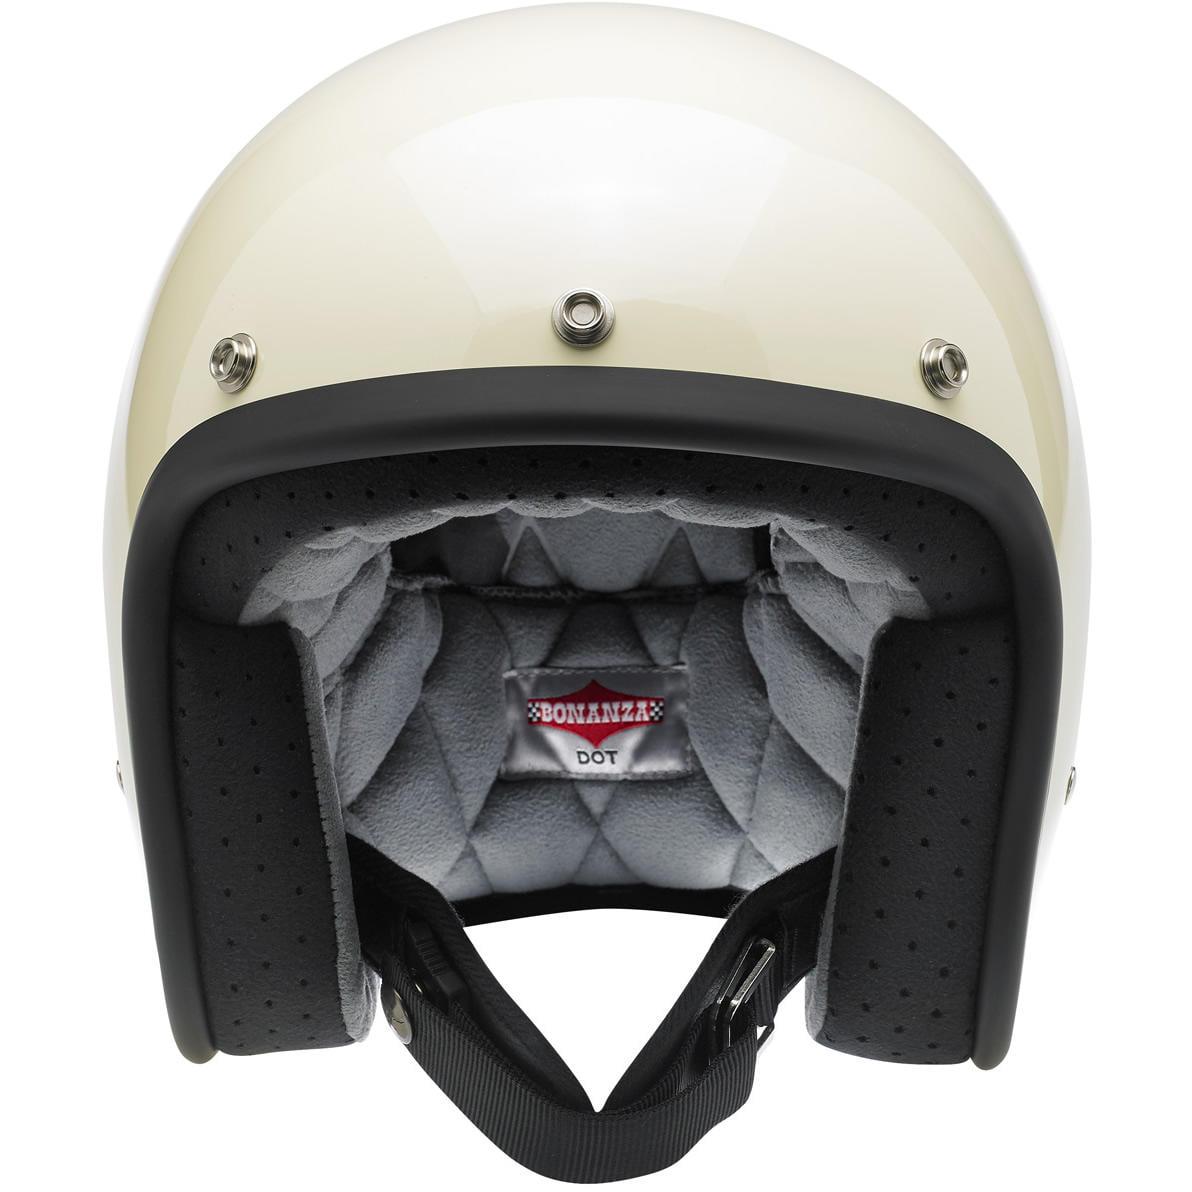 Biltwell BONANZA Motorcycle Helmet 3/4 Open Face XS-2XL FREE Expedited Shipping